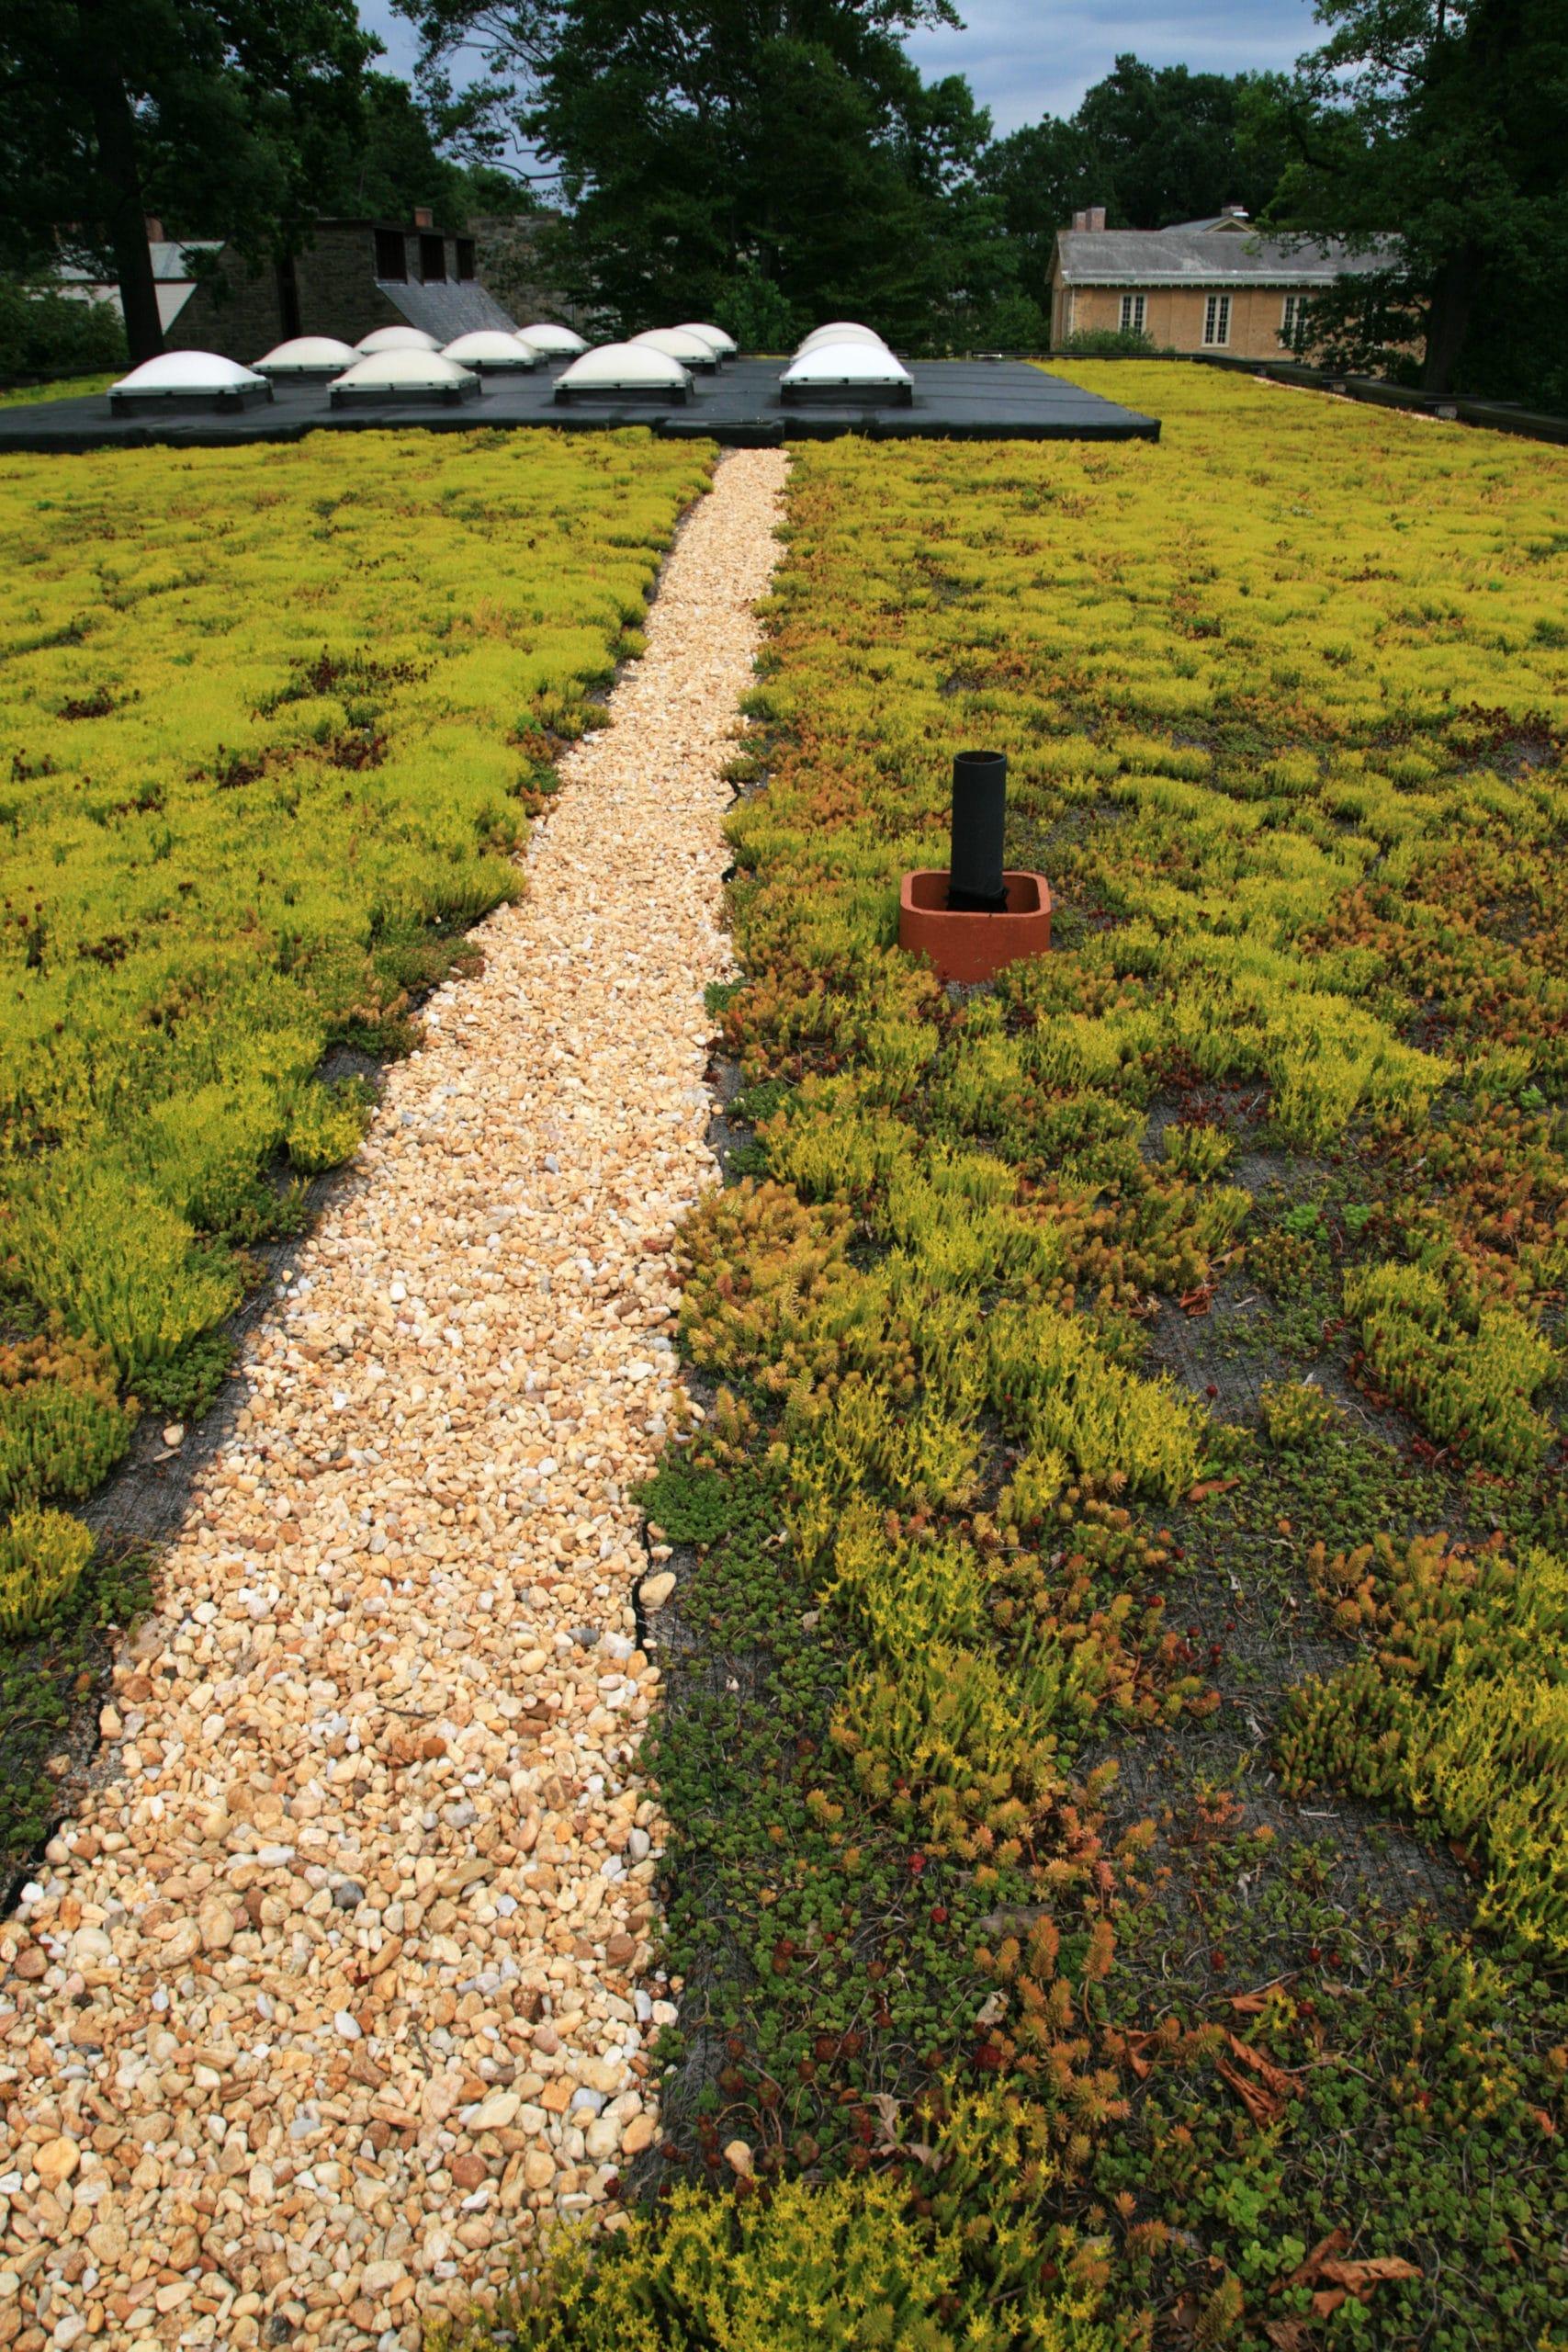 isolation toiture-terrasse vegetalisee polystyrene expanse